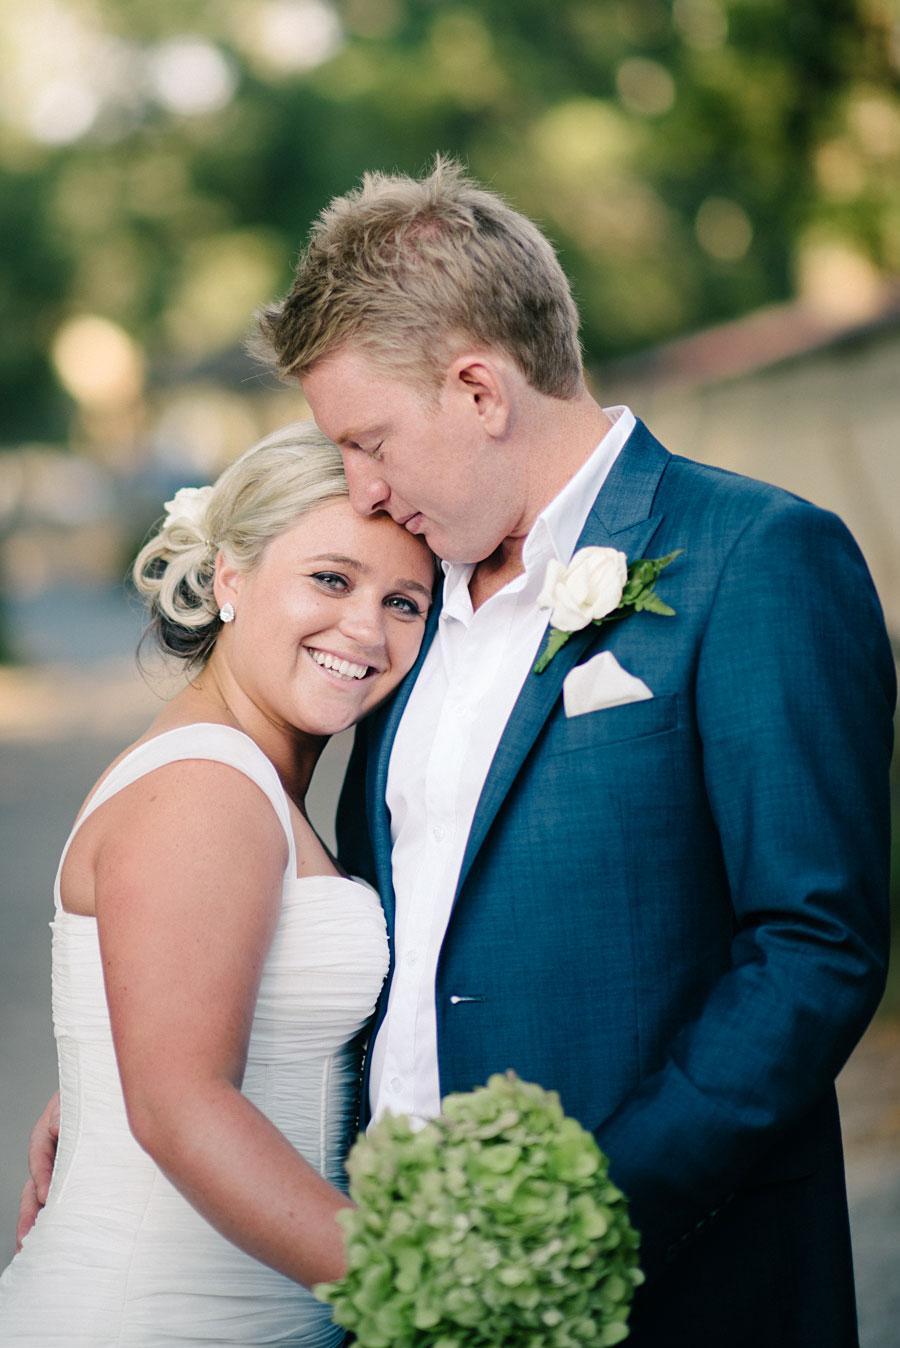 wedding-photography-melbourne-daniel-bilsborough-190.jpg